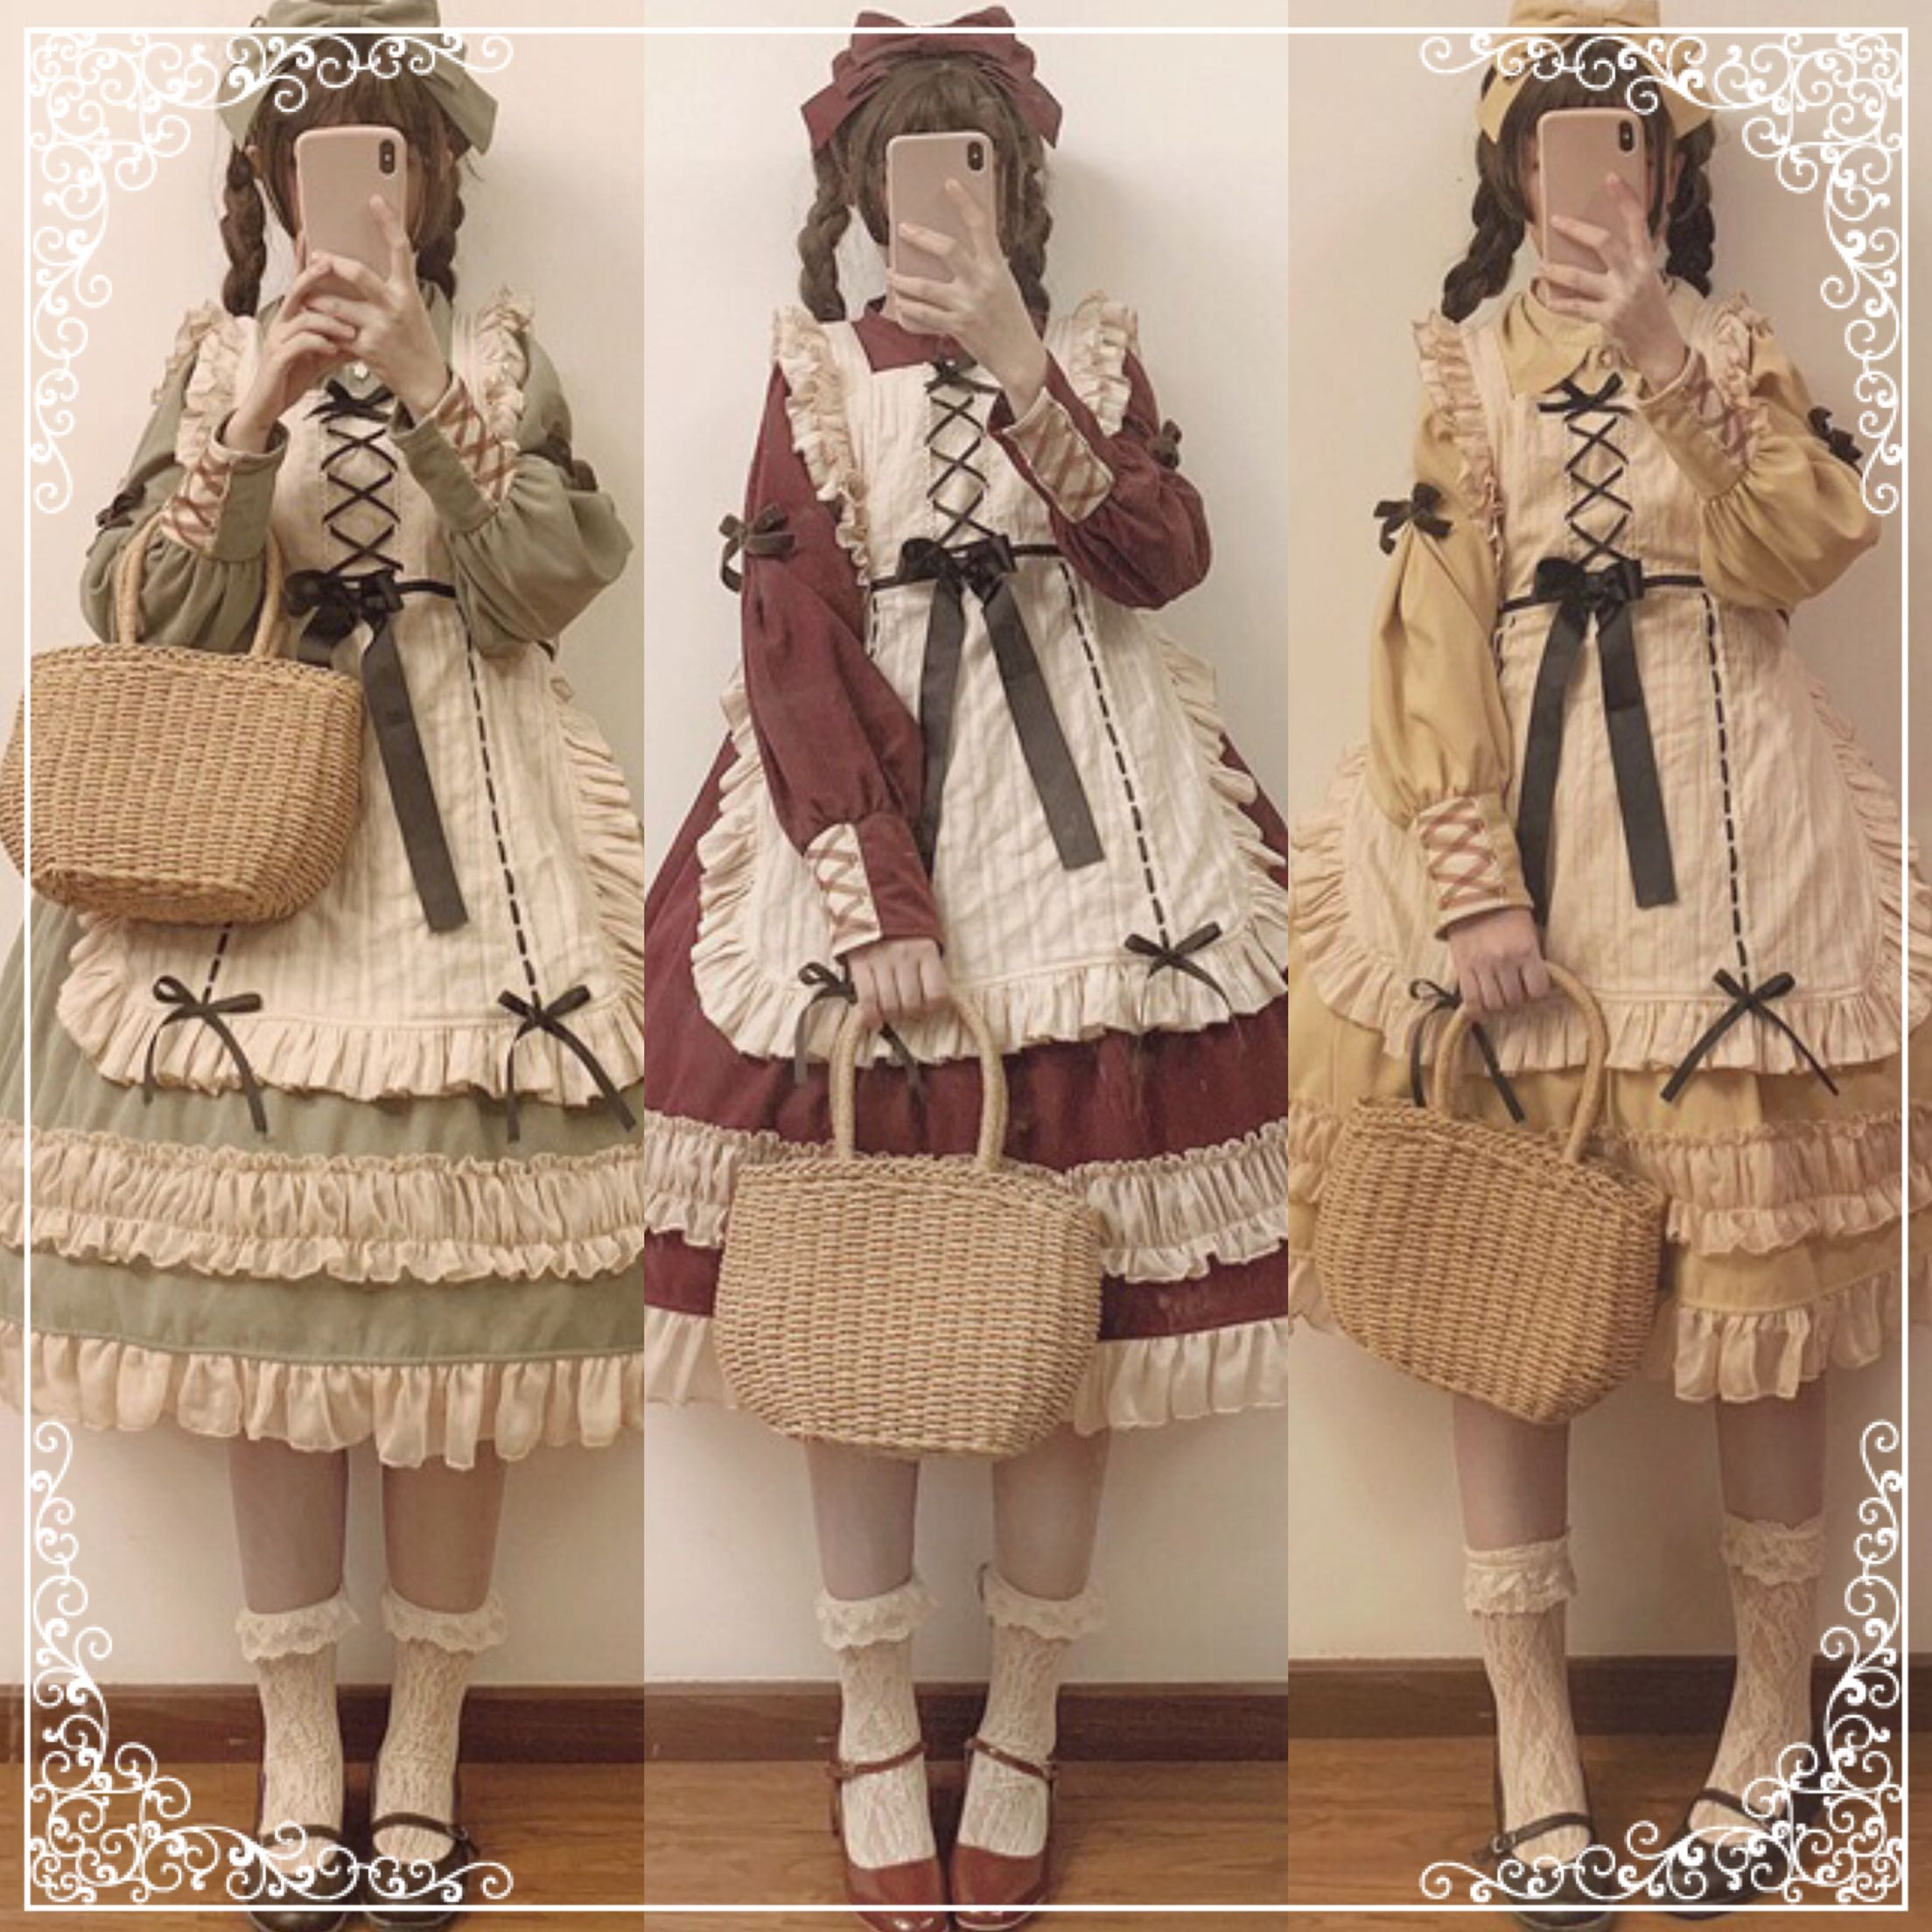 Japanese Sweet Lolita Dress Vintage Bandage Lace Bowknot Peter Pan Collar Victorian Dress Kawaii Girl Gothic Lolita Op Loli Cos